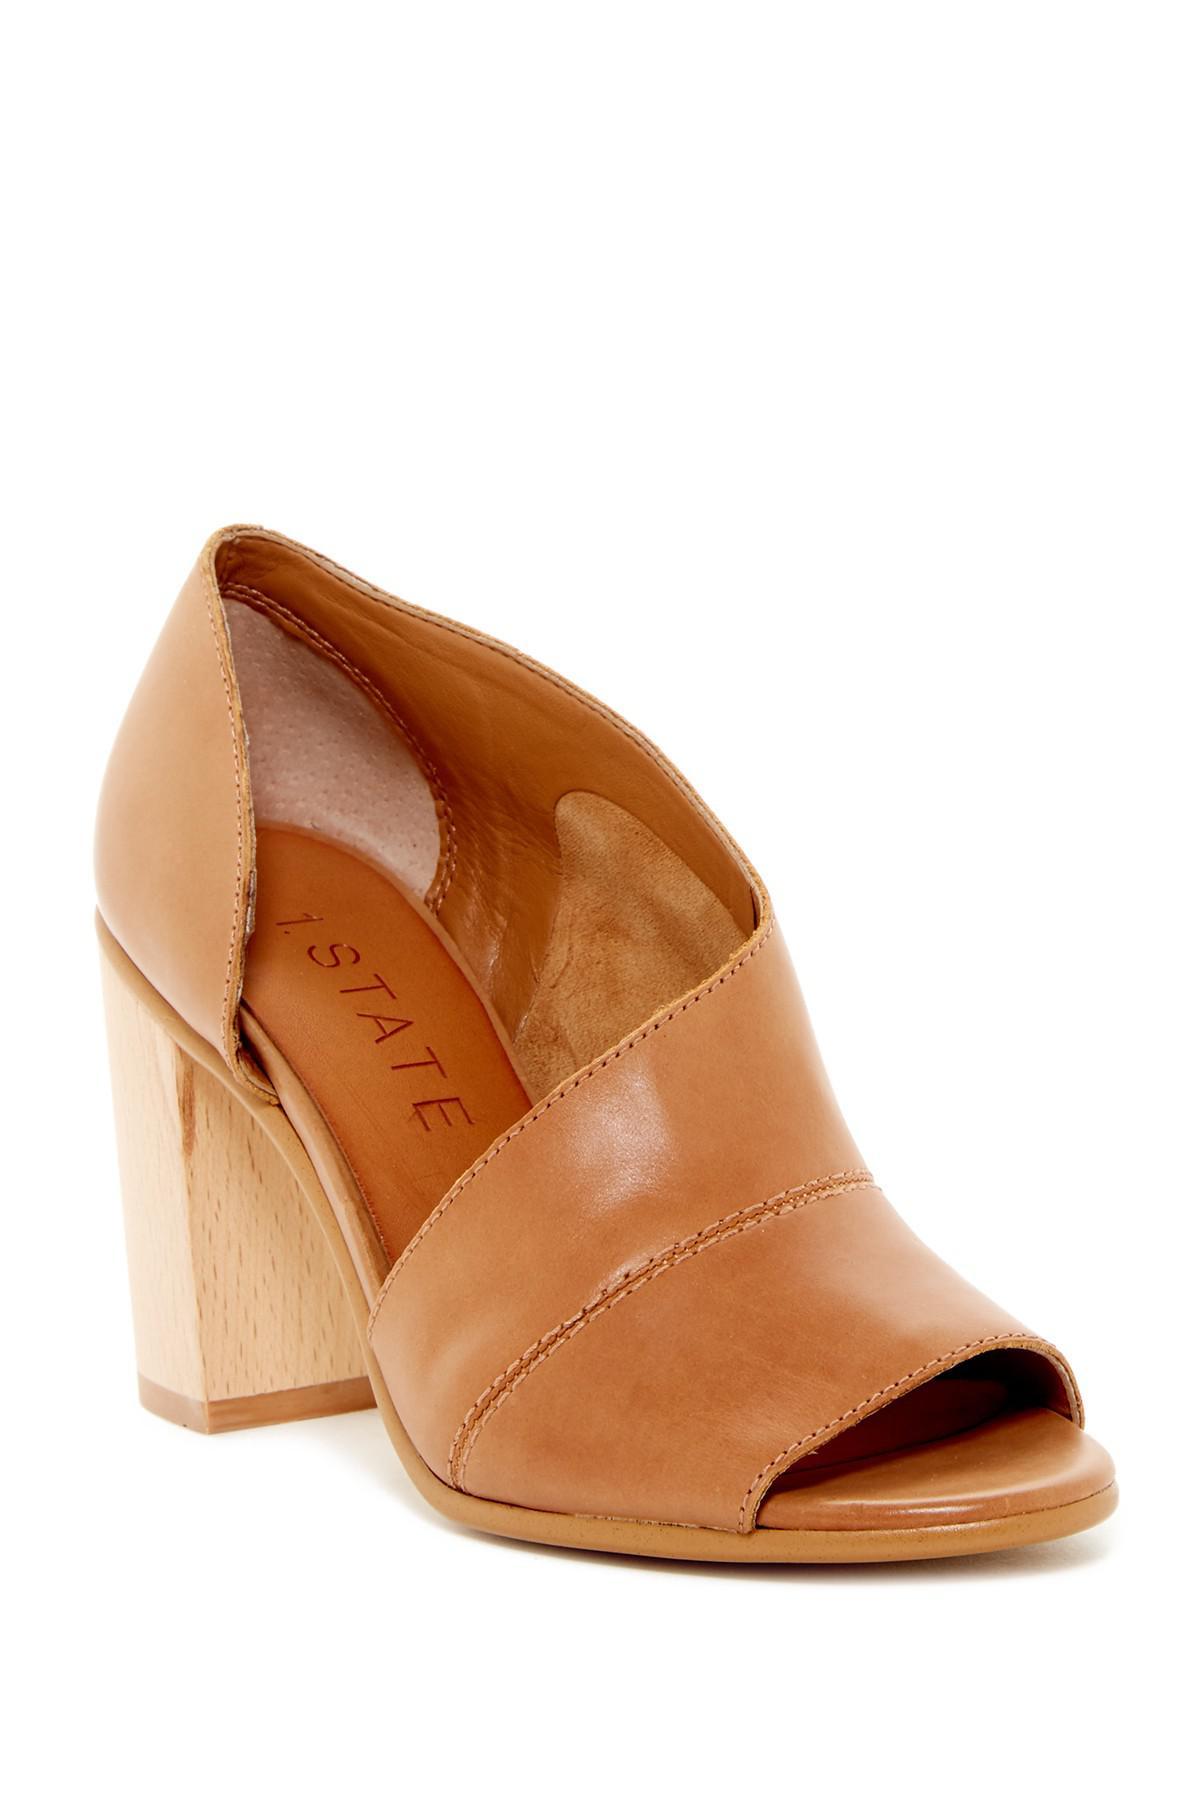 1.State Amble Block Heel Sandal US6ysvyx